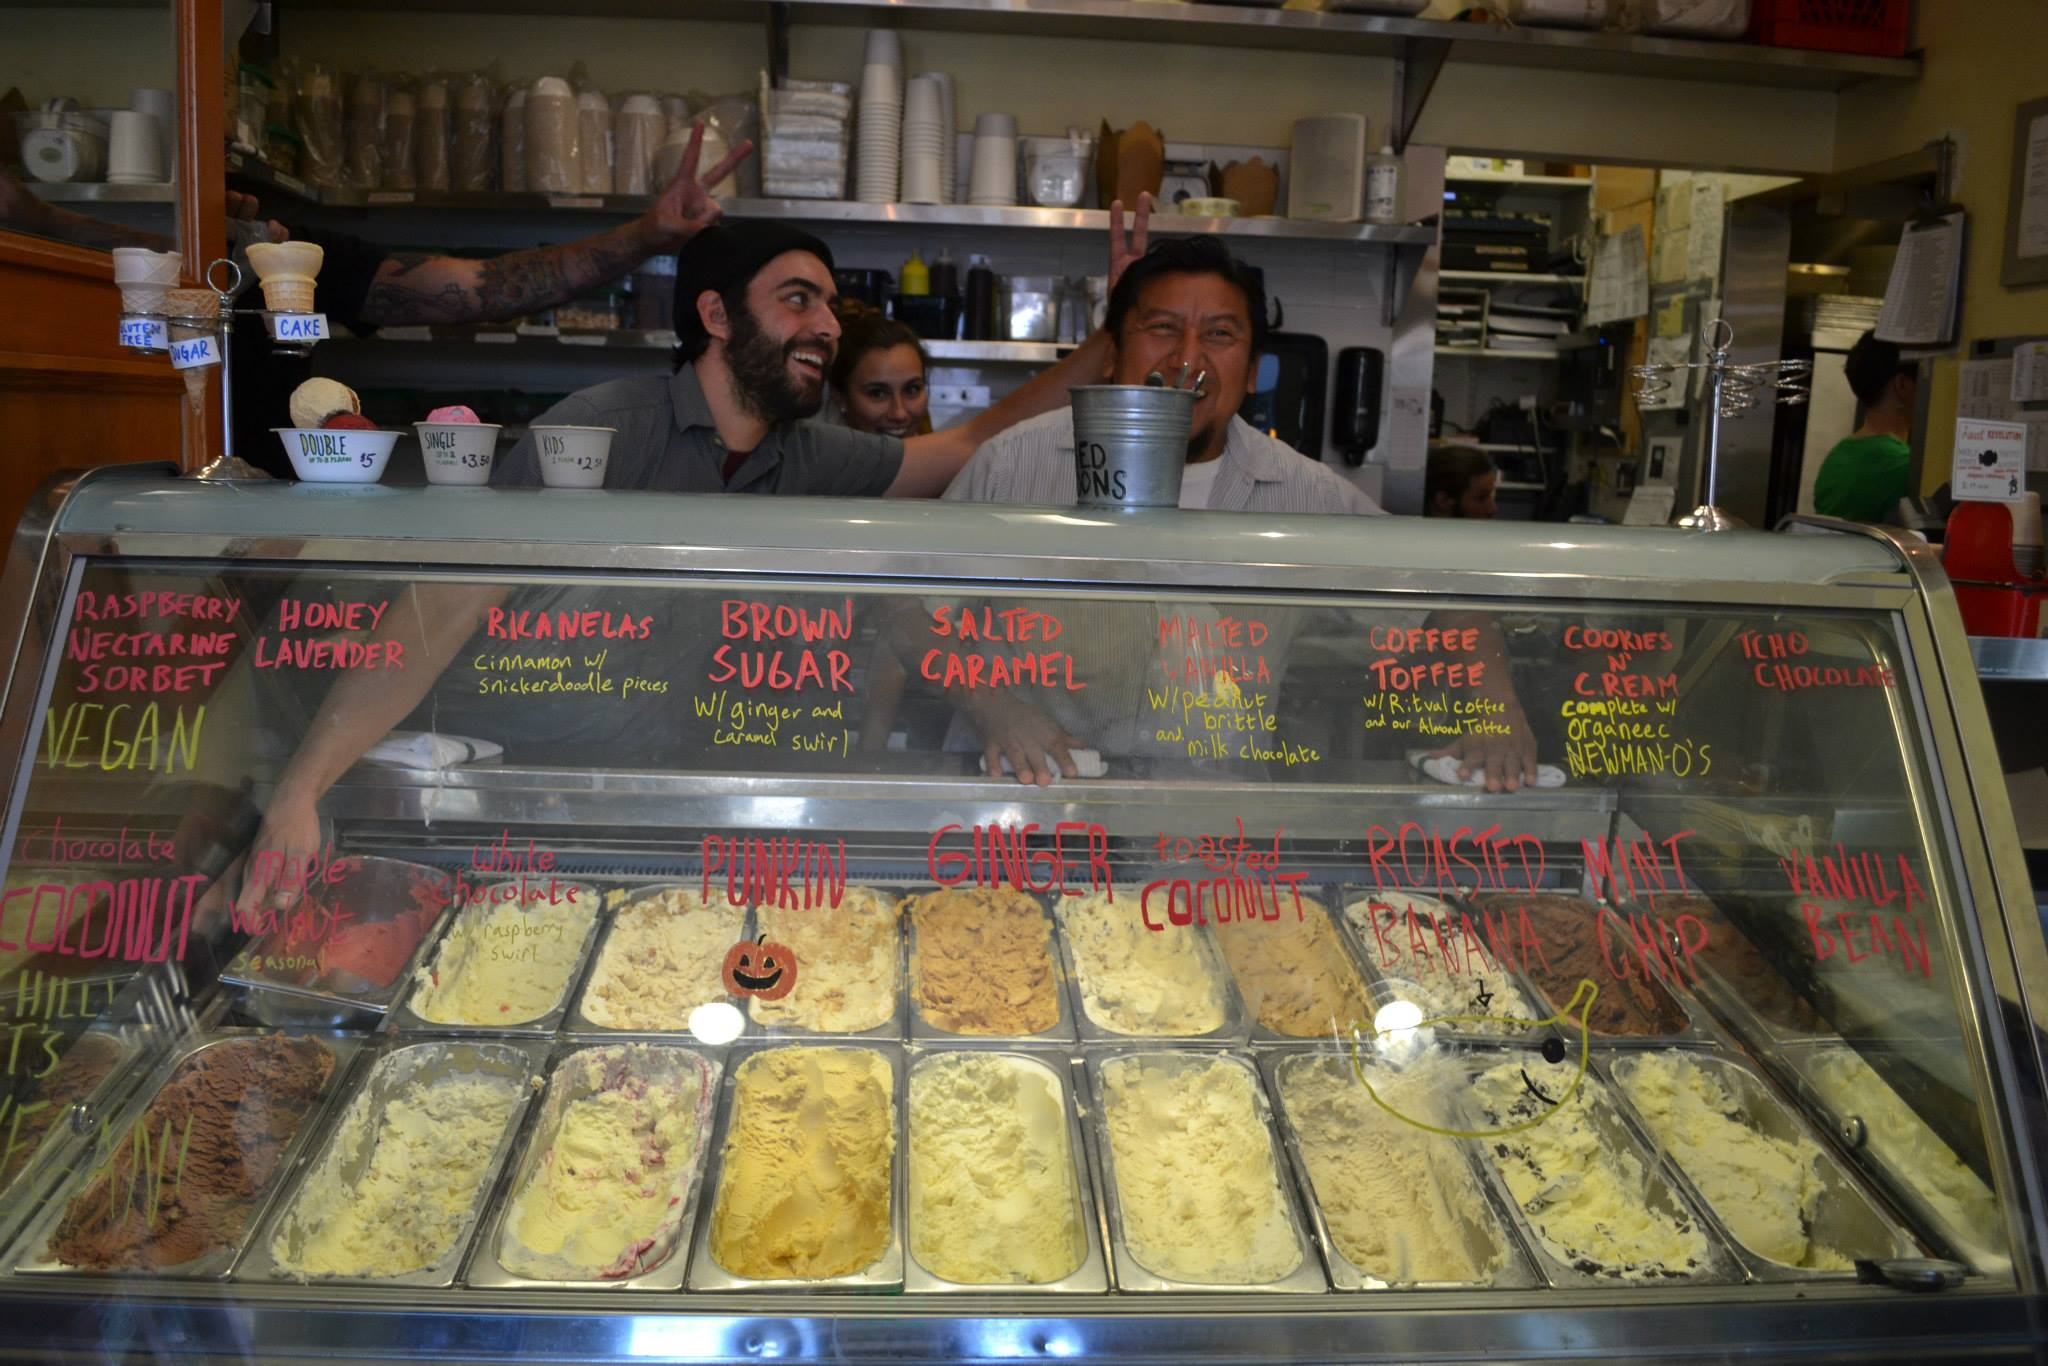 Homemade Ice Cream at Bi-Rite Creamery in San Francisco